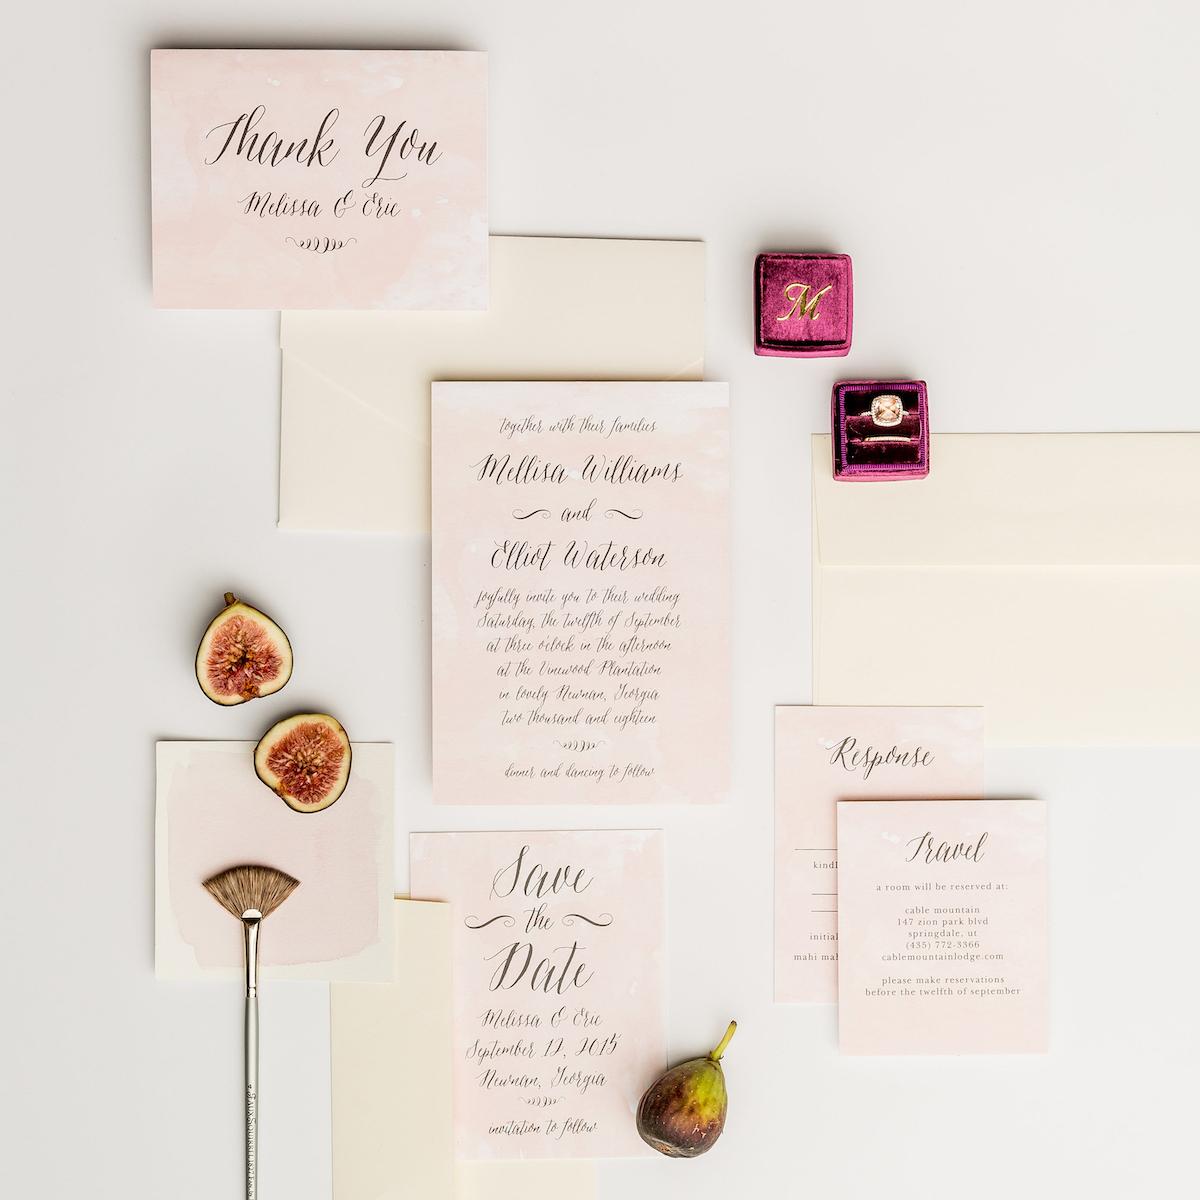 Basic_Invite_Spring_Wedding_23.jpg